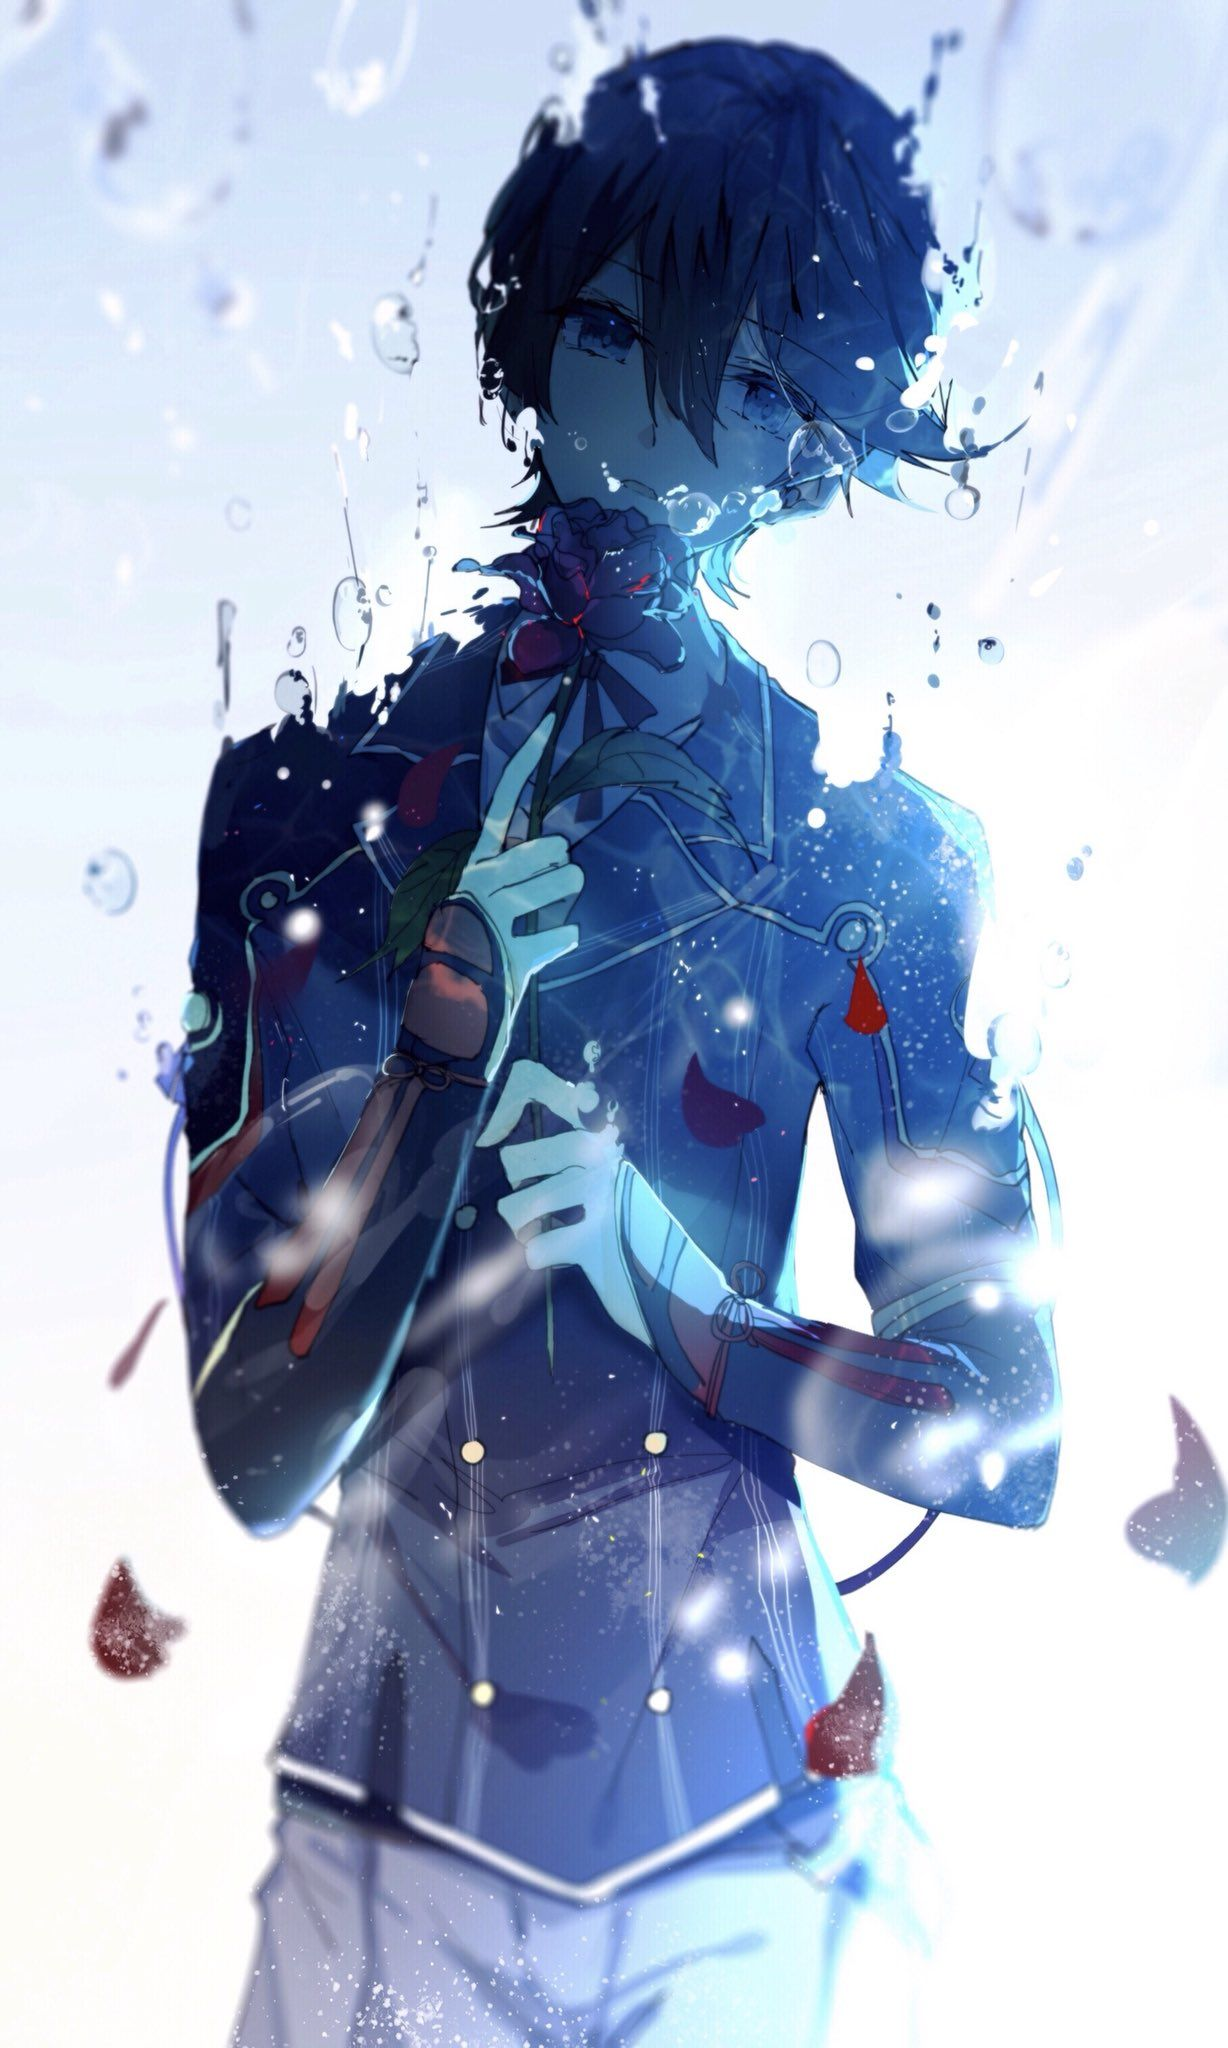 Anime Guy Blue Epic Anime Art Blue Eyes Water Blue Anime Cute Anime Boy Cute Anime Guys